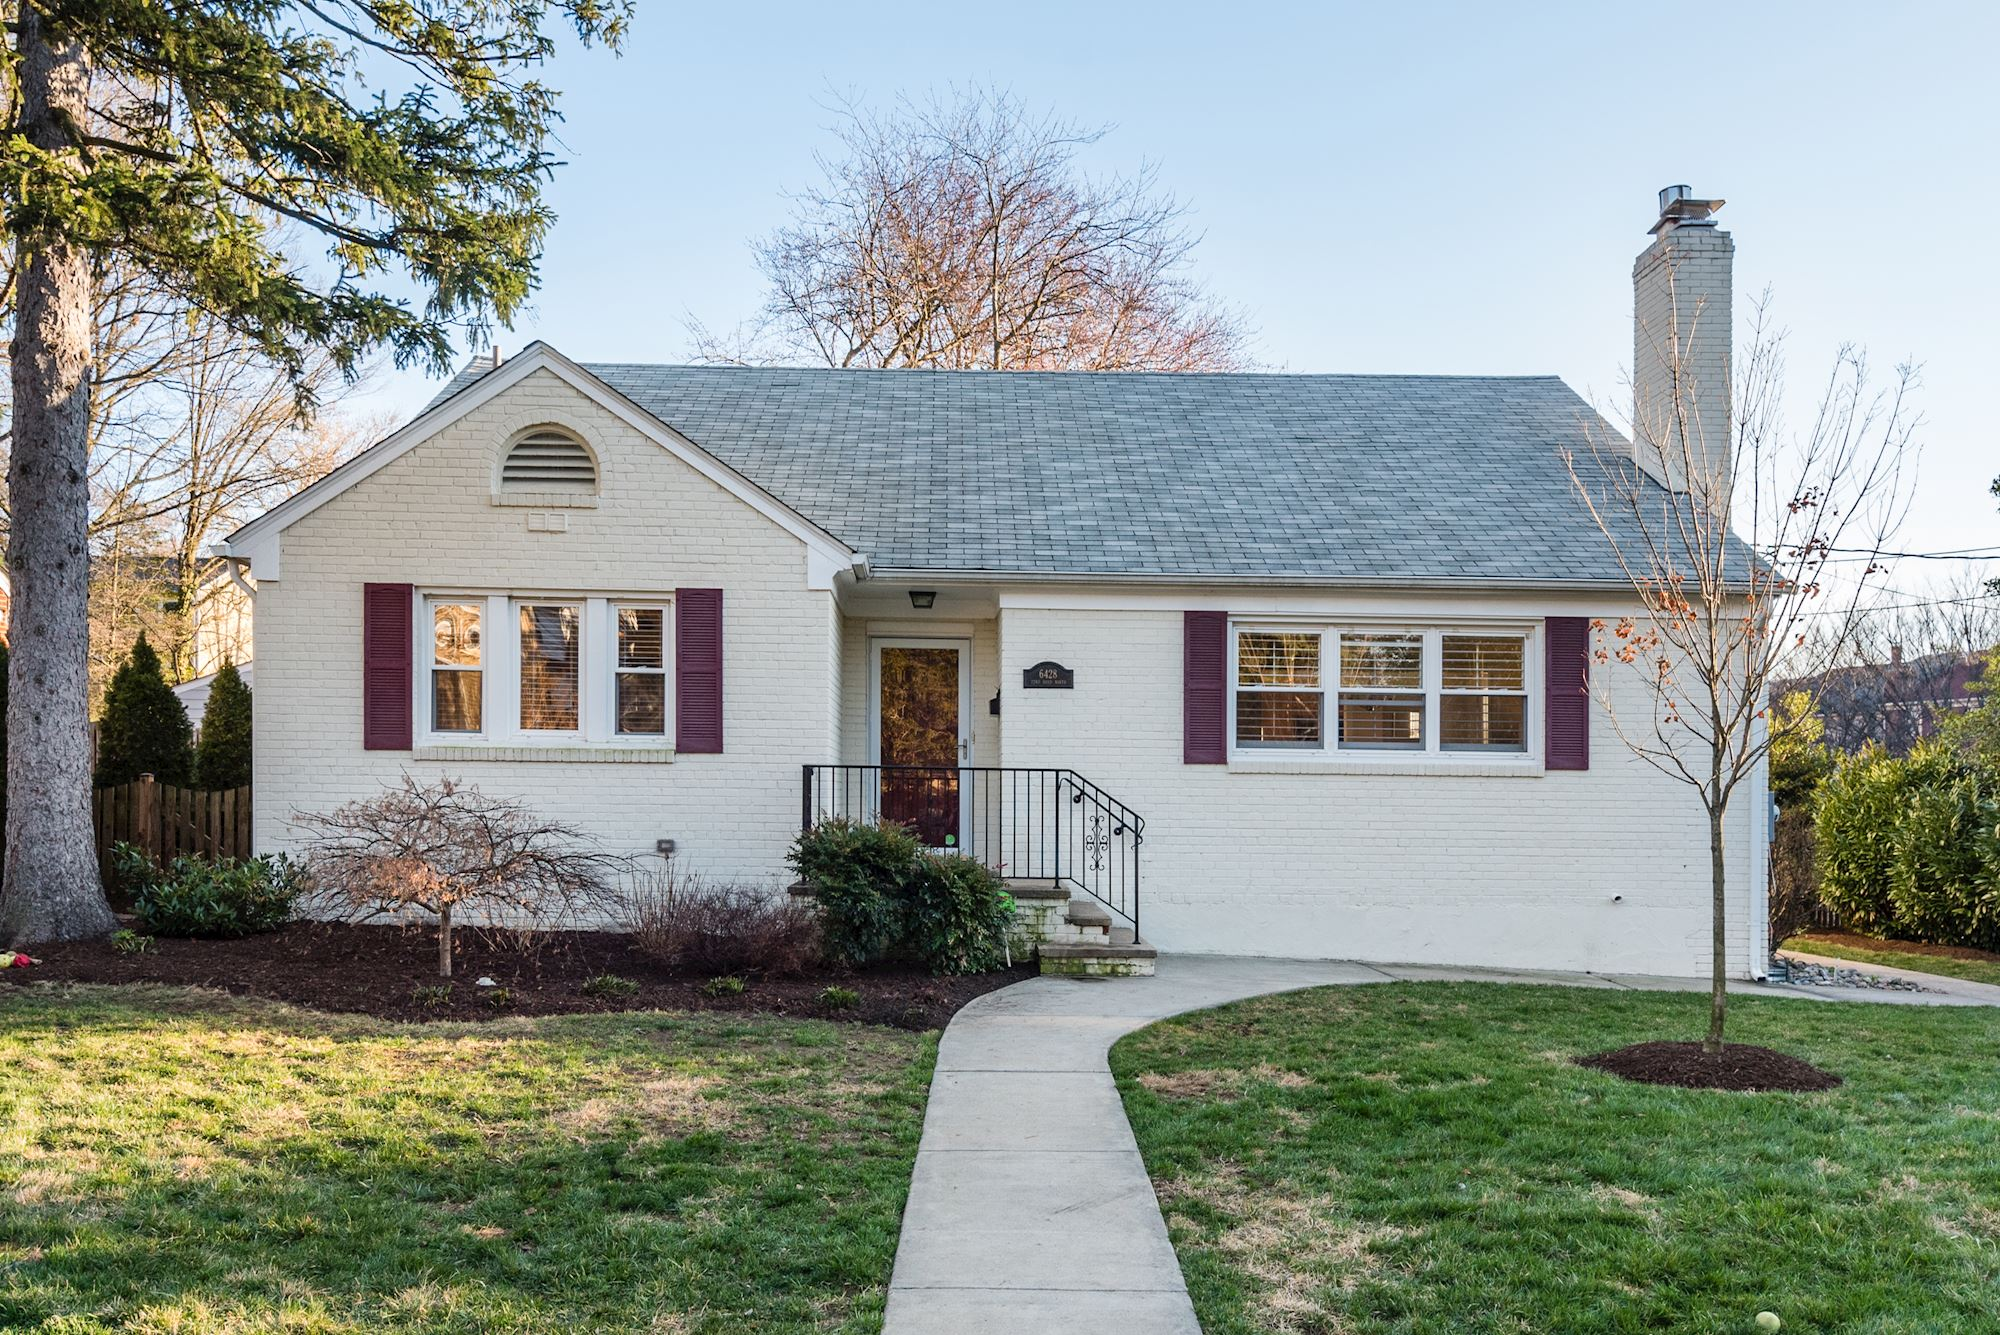 NEW LISTING: 5 Bedroom Arlington Home Close to EFC Metro